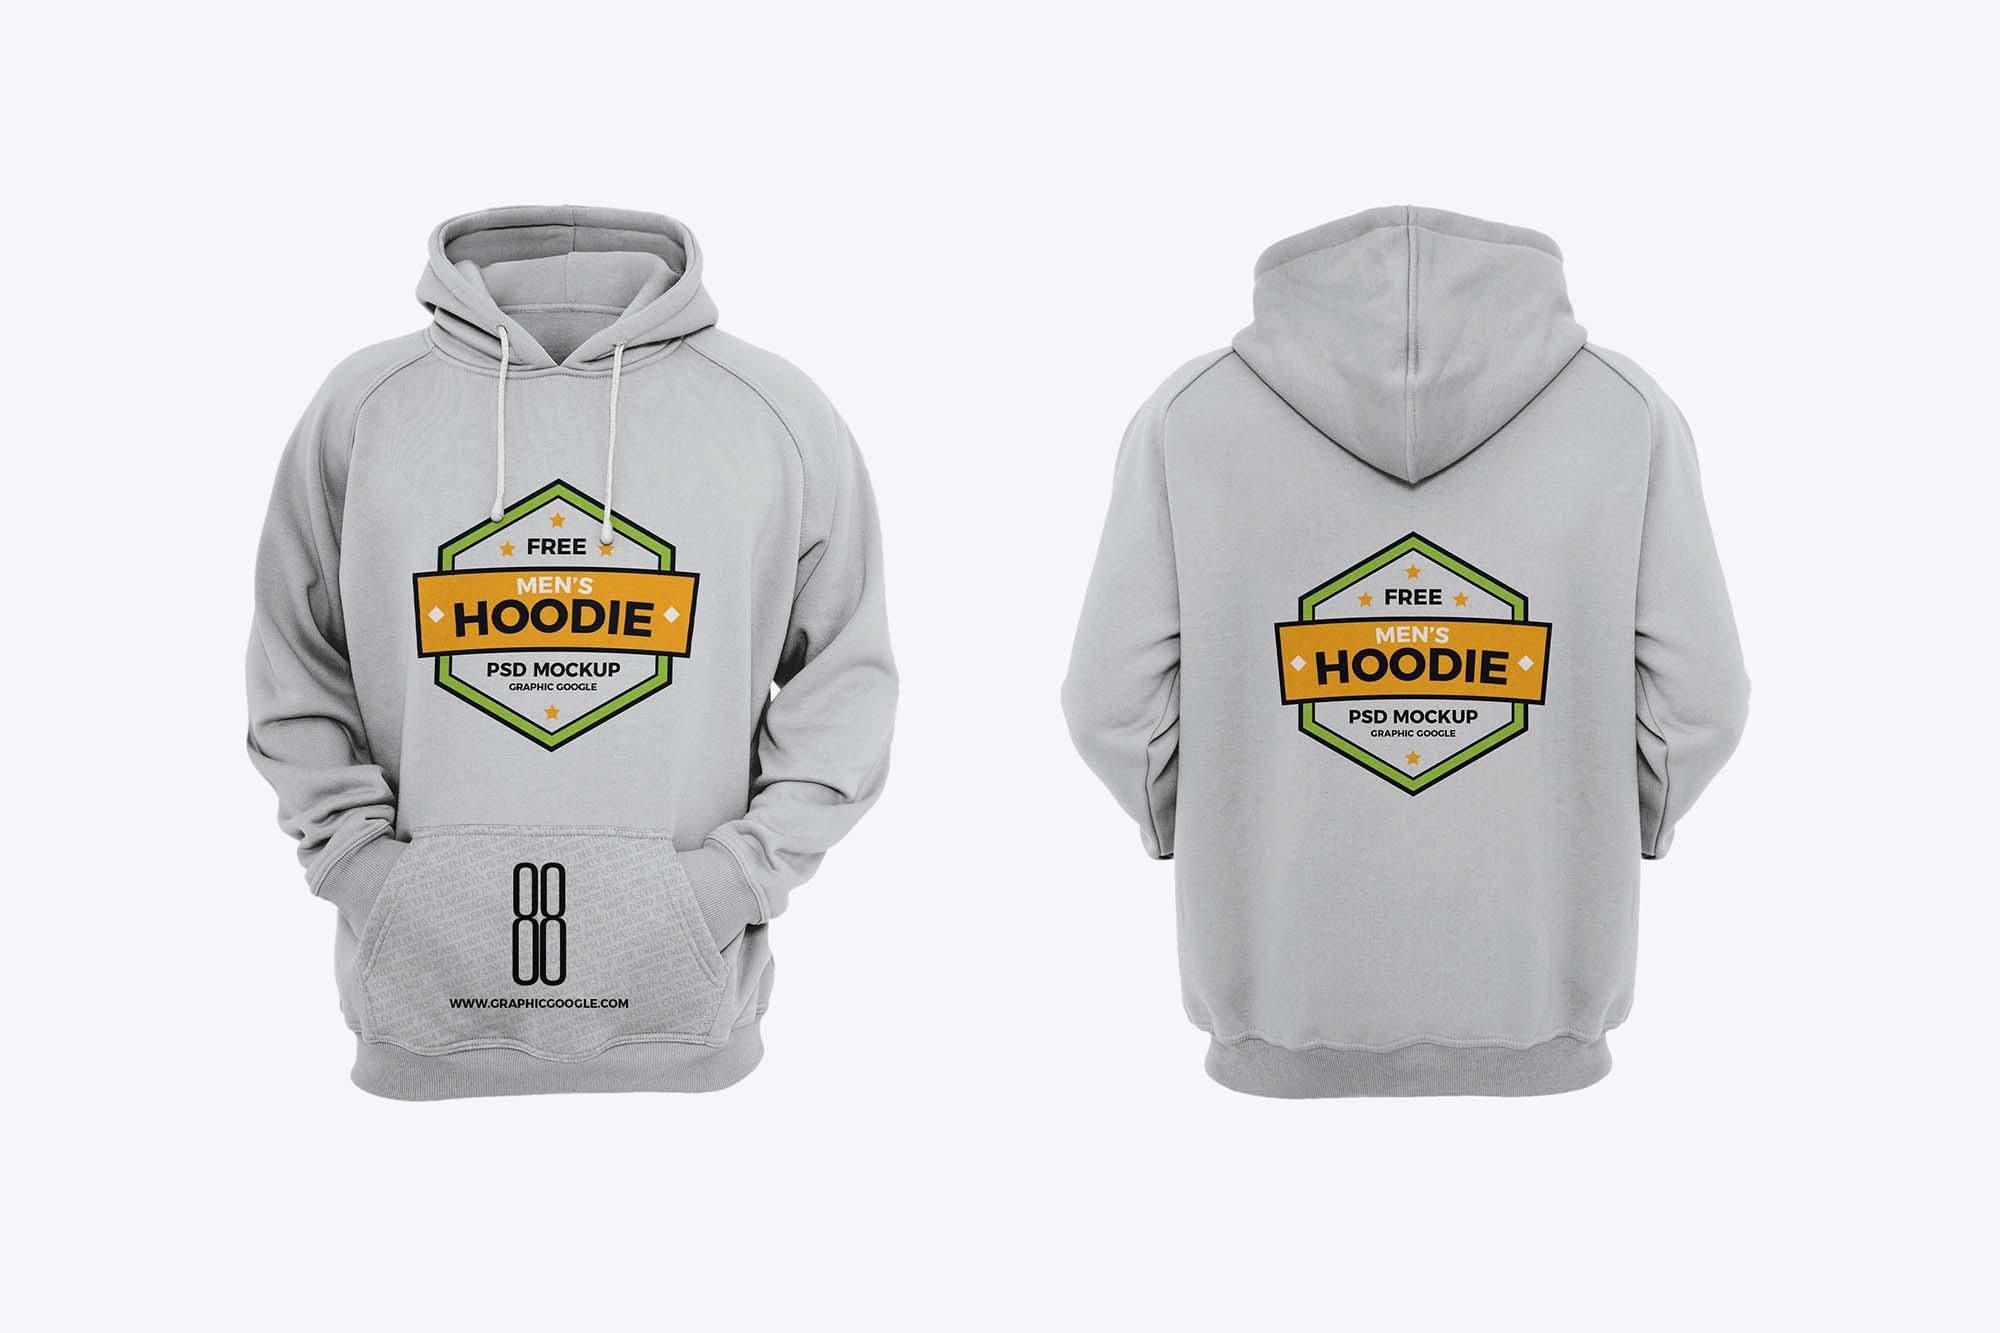 Download Free Hoodie for Men Mockup (PSD)